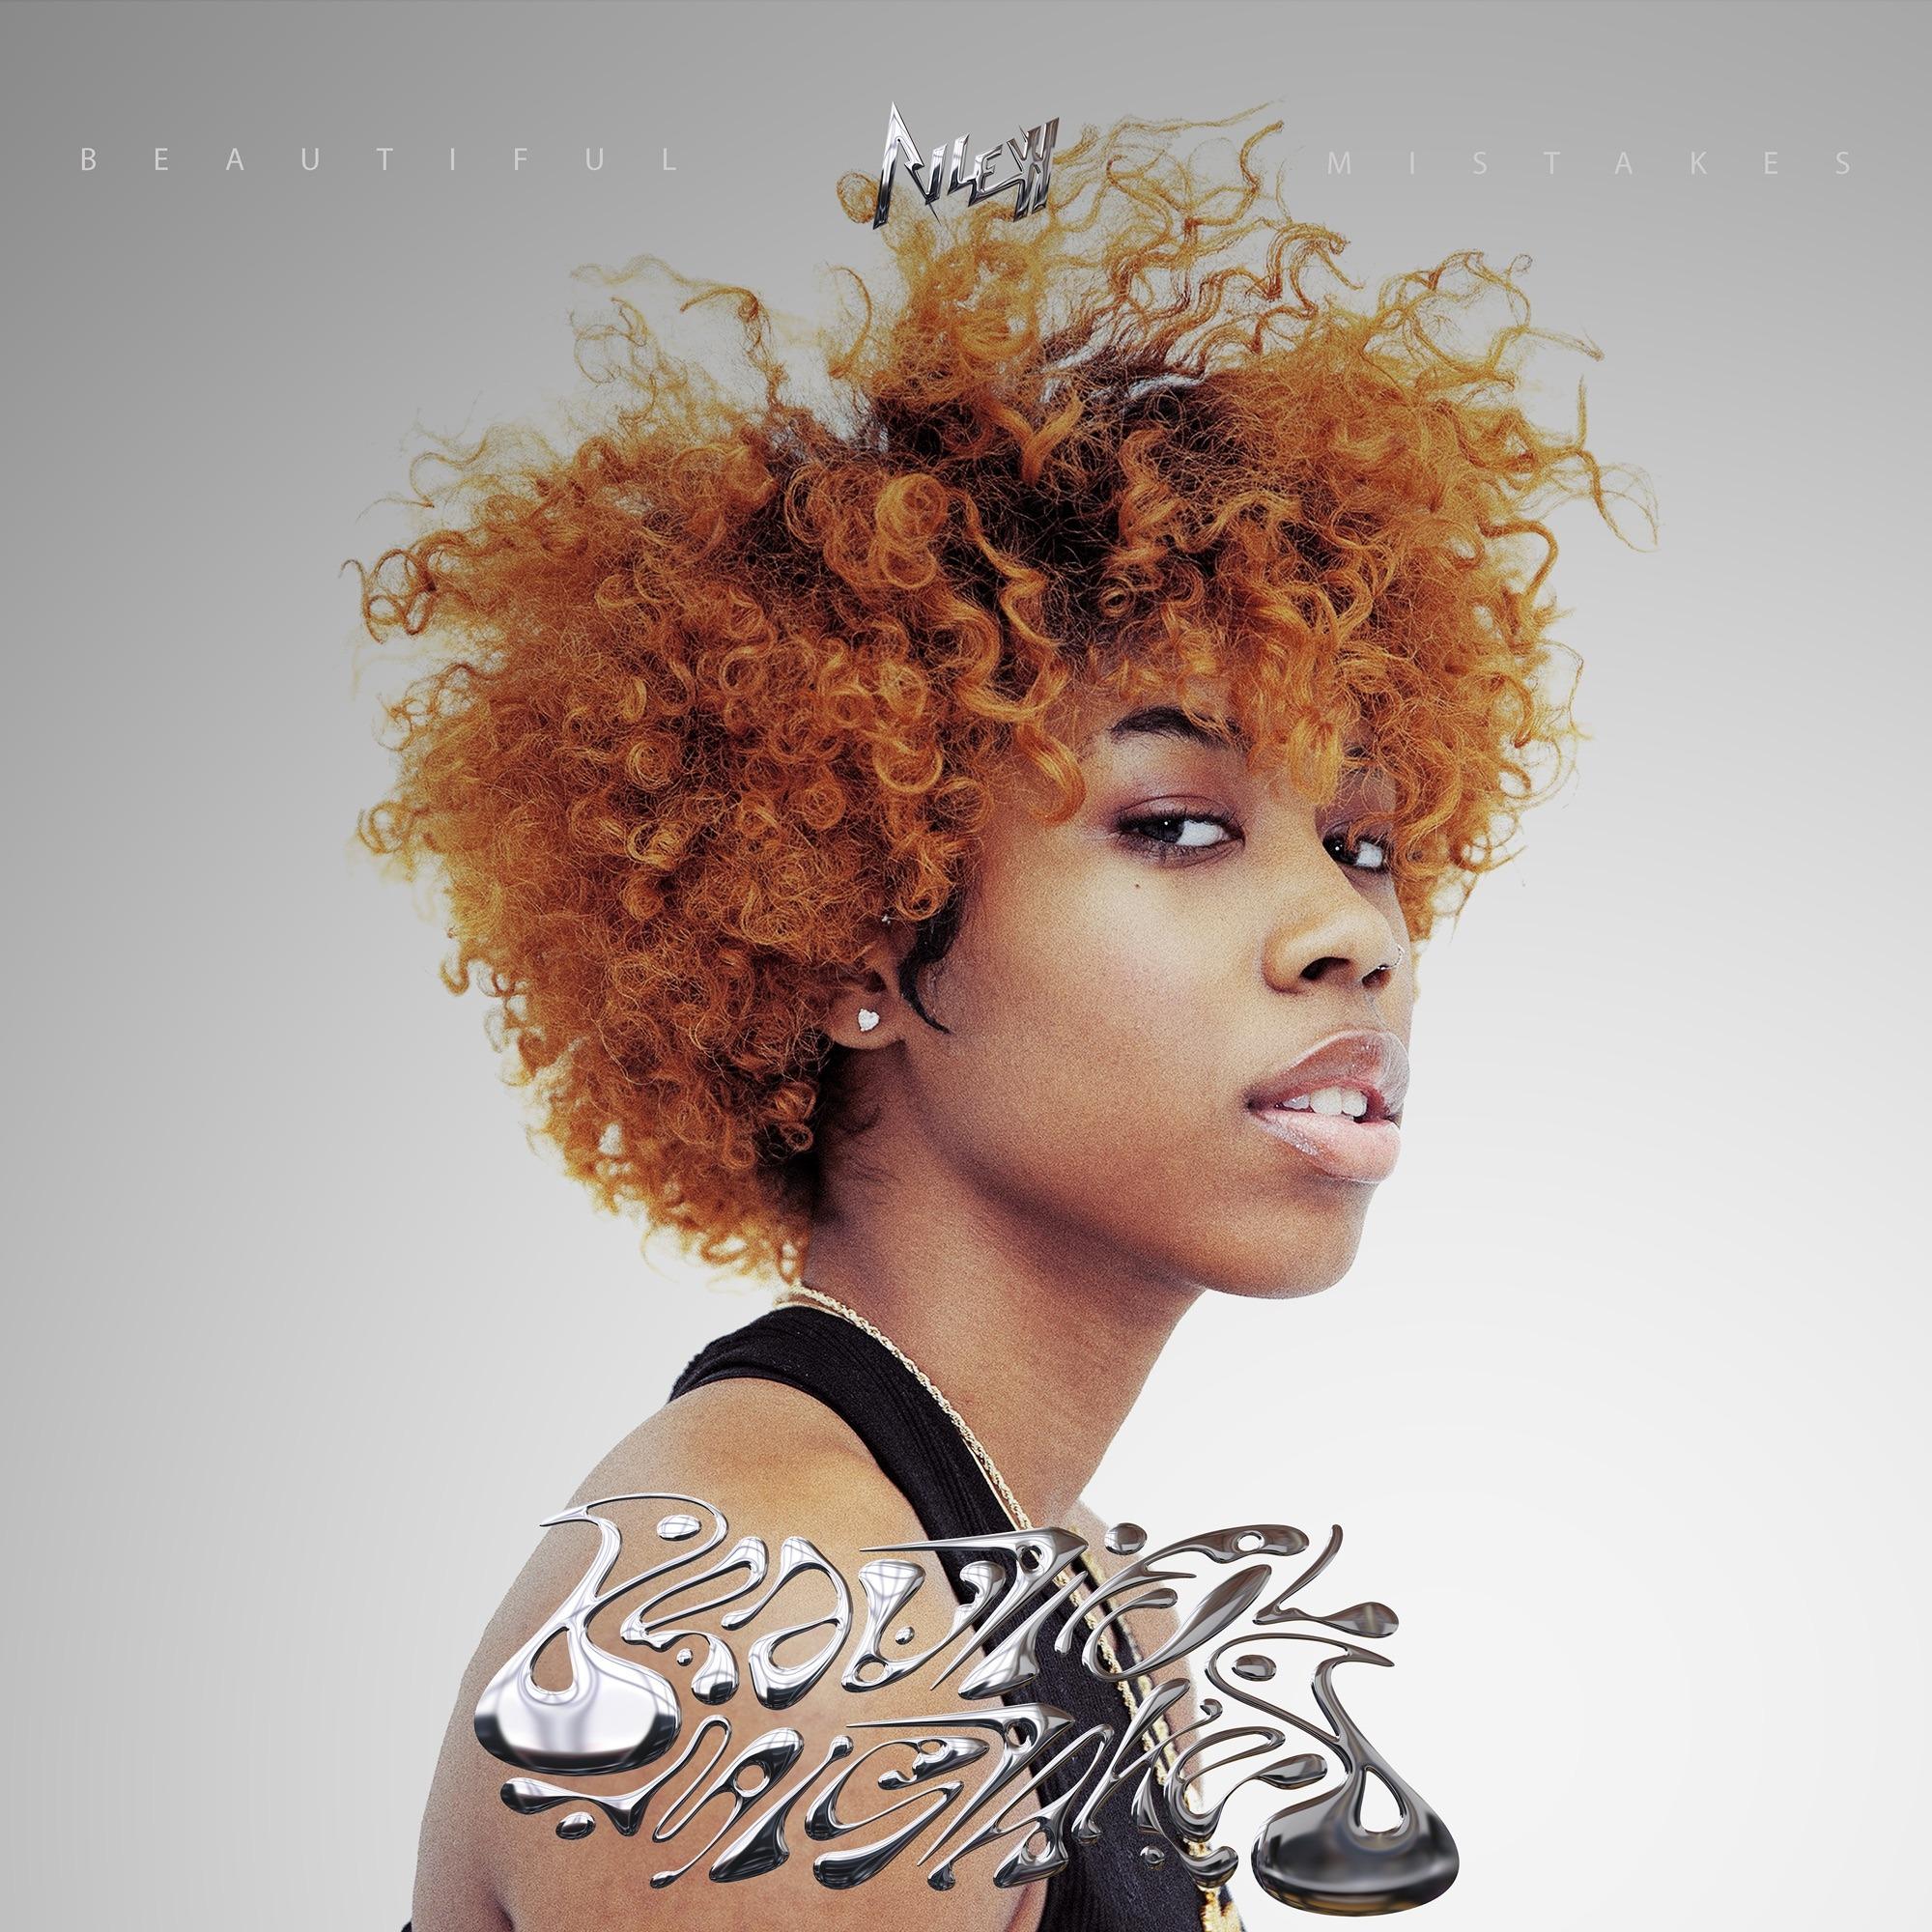 Rileyy Lanez – Beautiful Mistakes